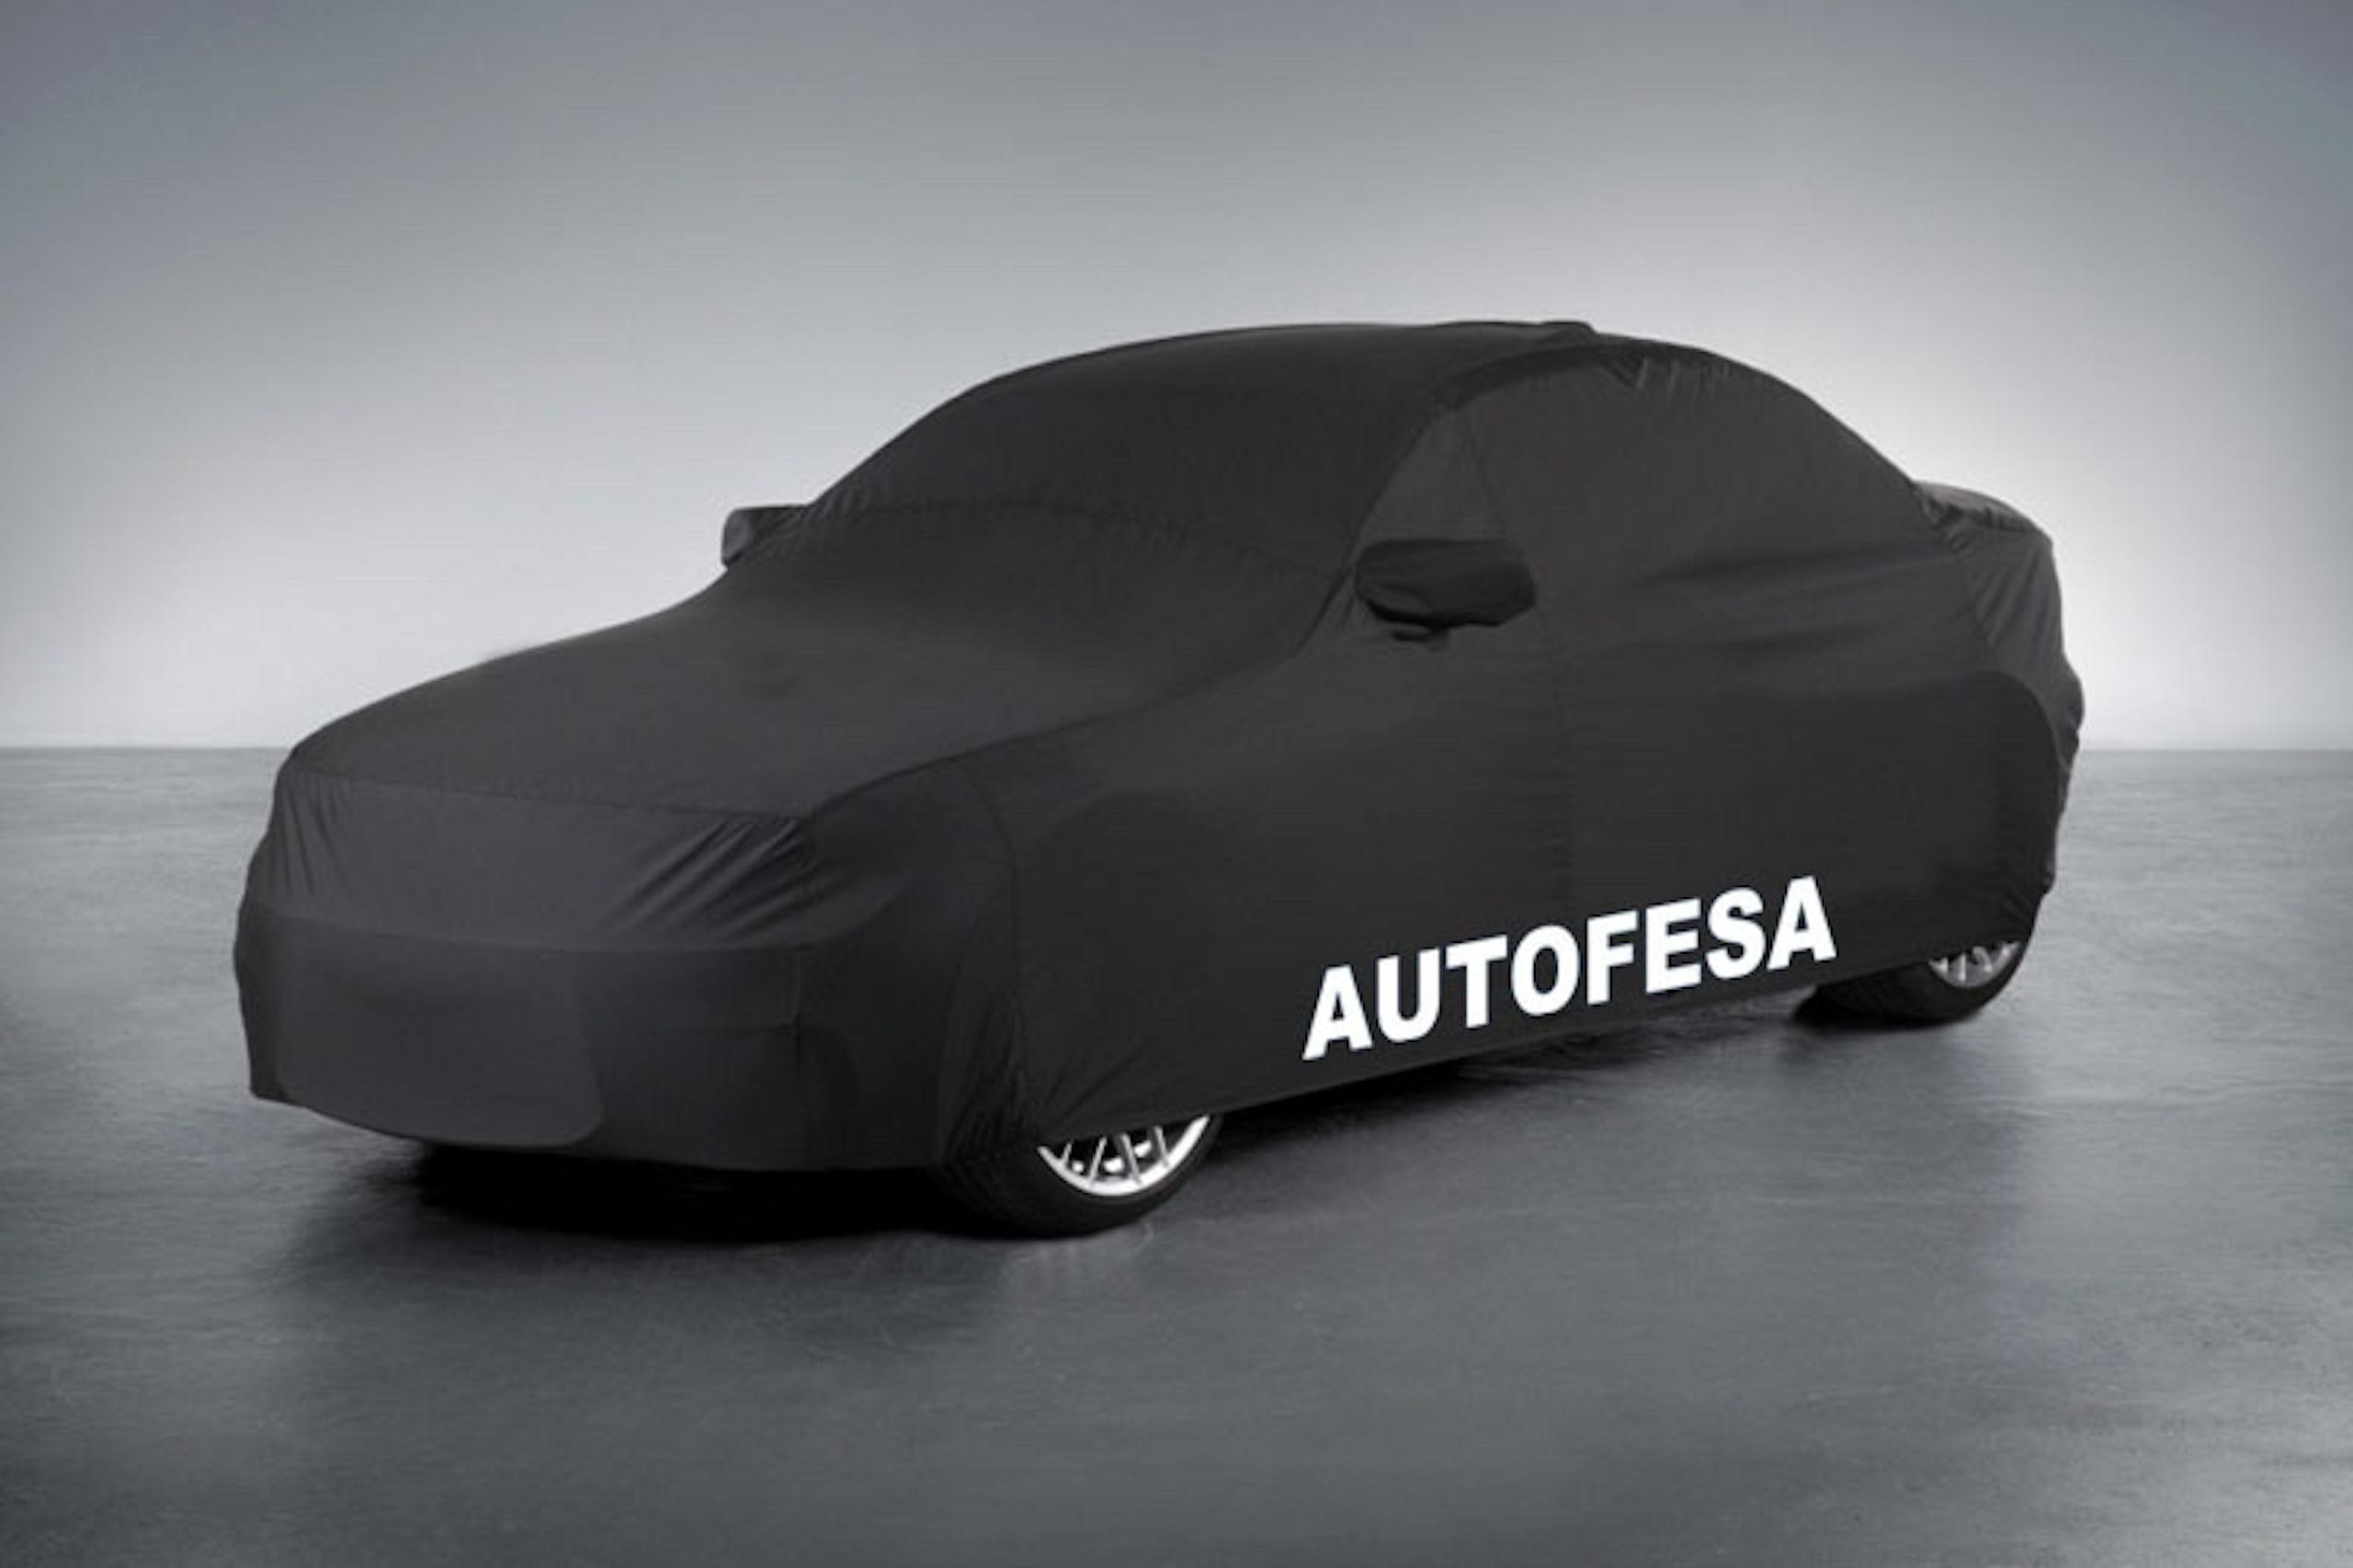 Audi A4 Avant 2.0 TDI 150cv Auto 5p S/S